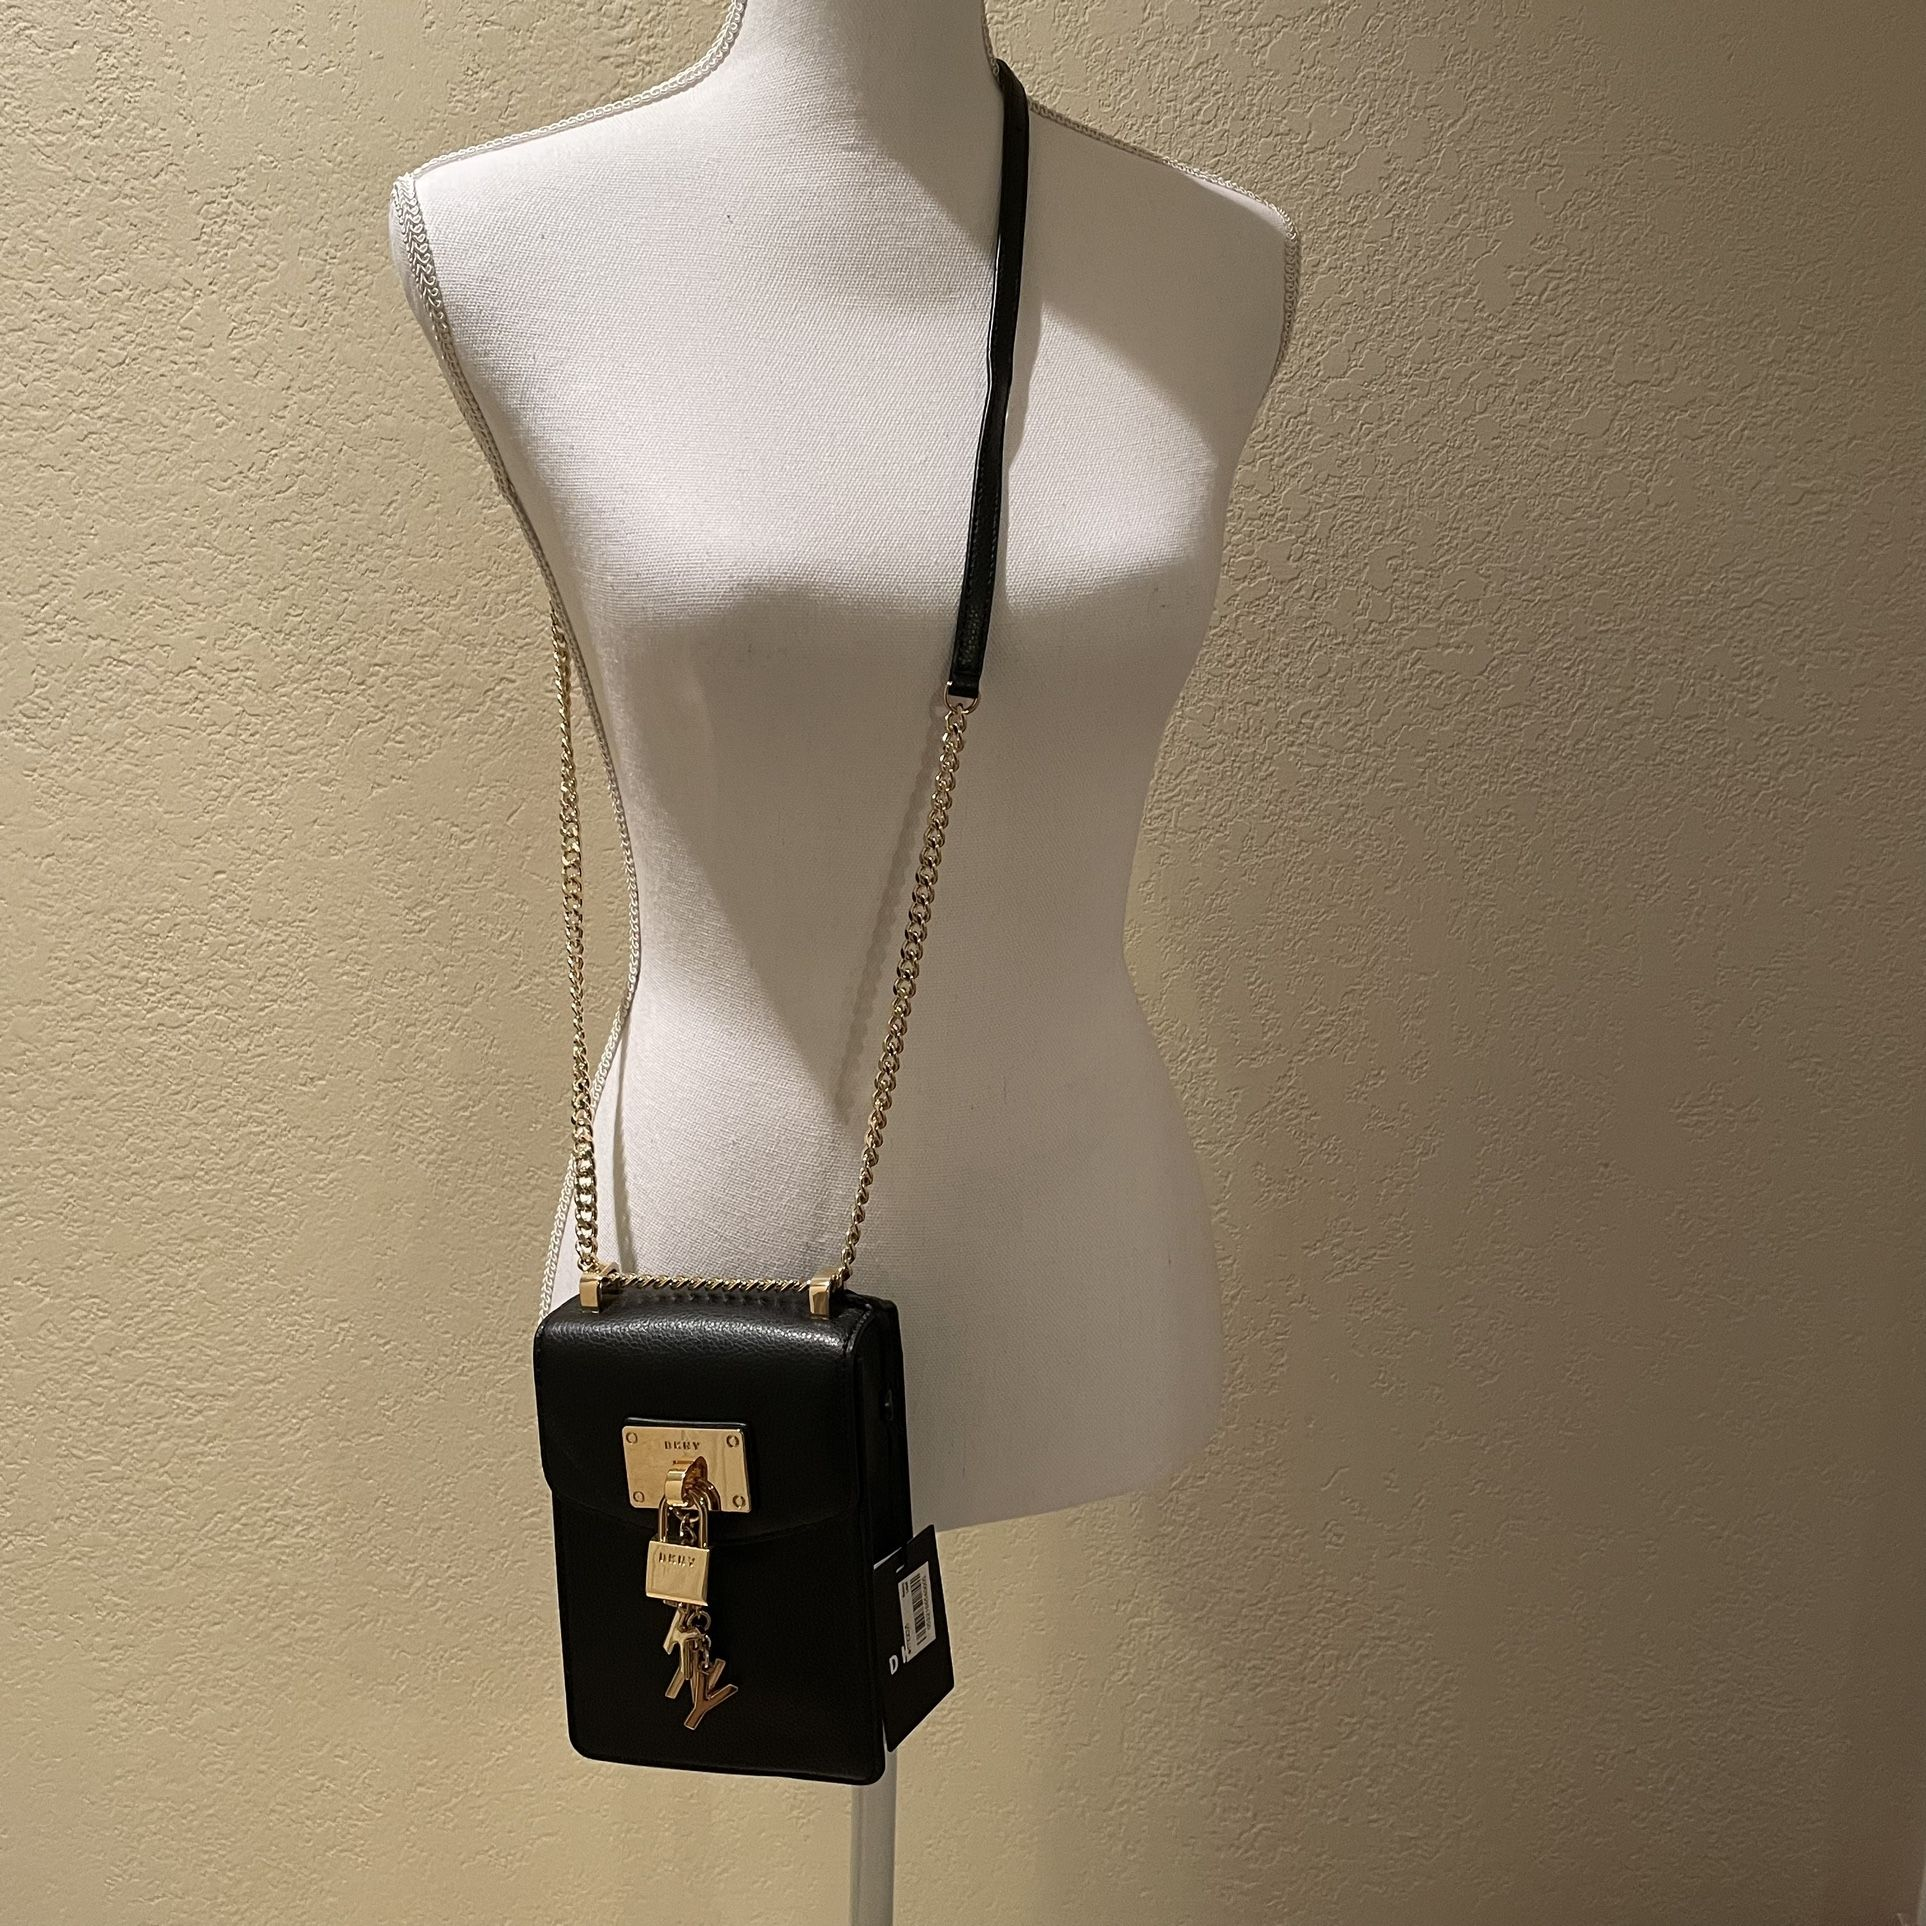 NWT DKNY Black & Gold Crossbody Purse